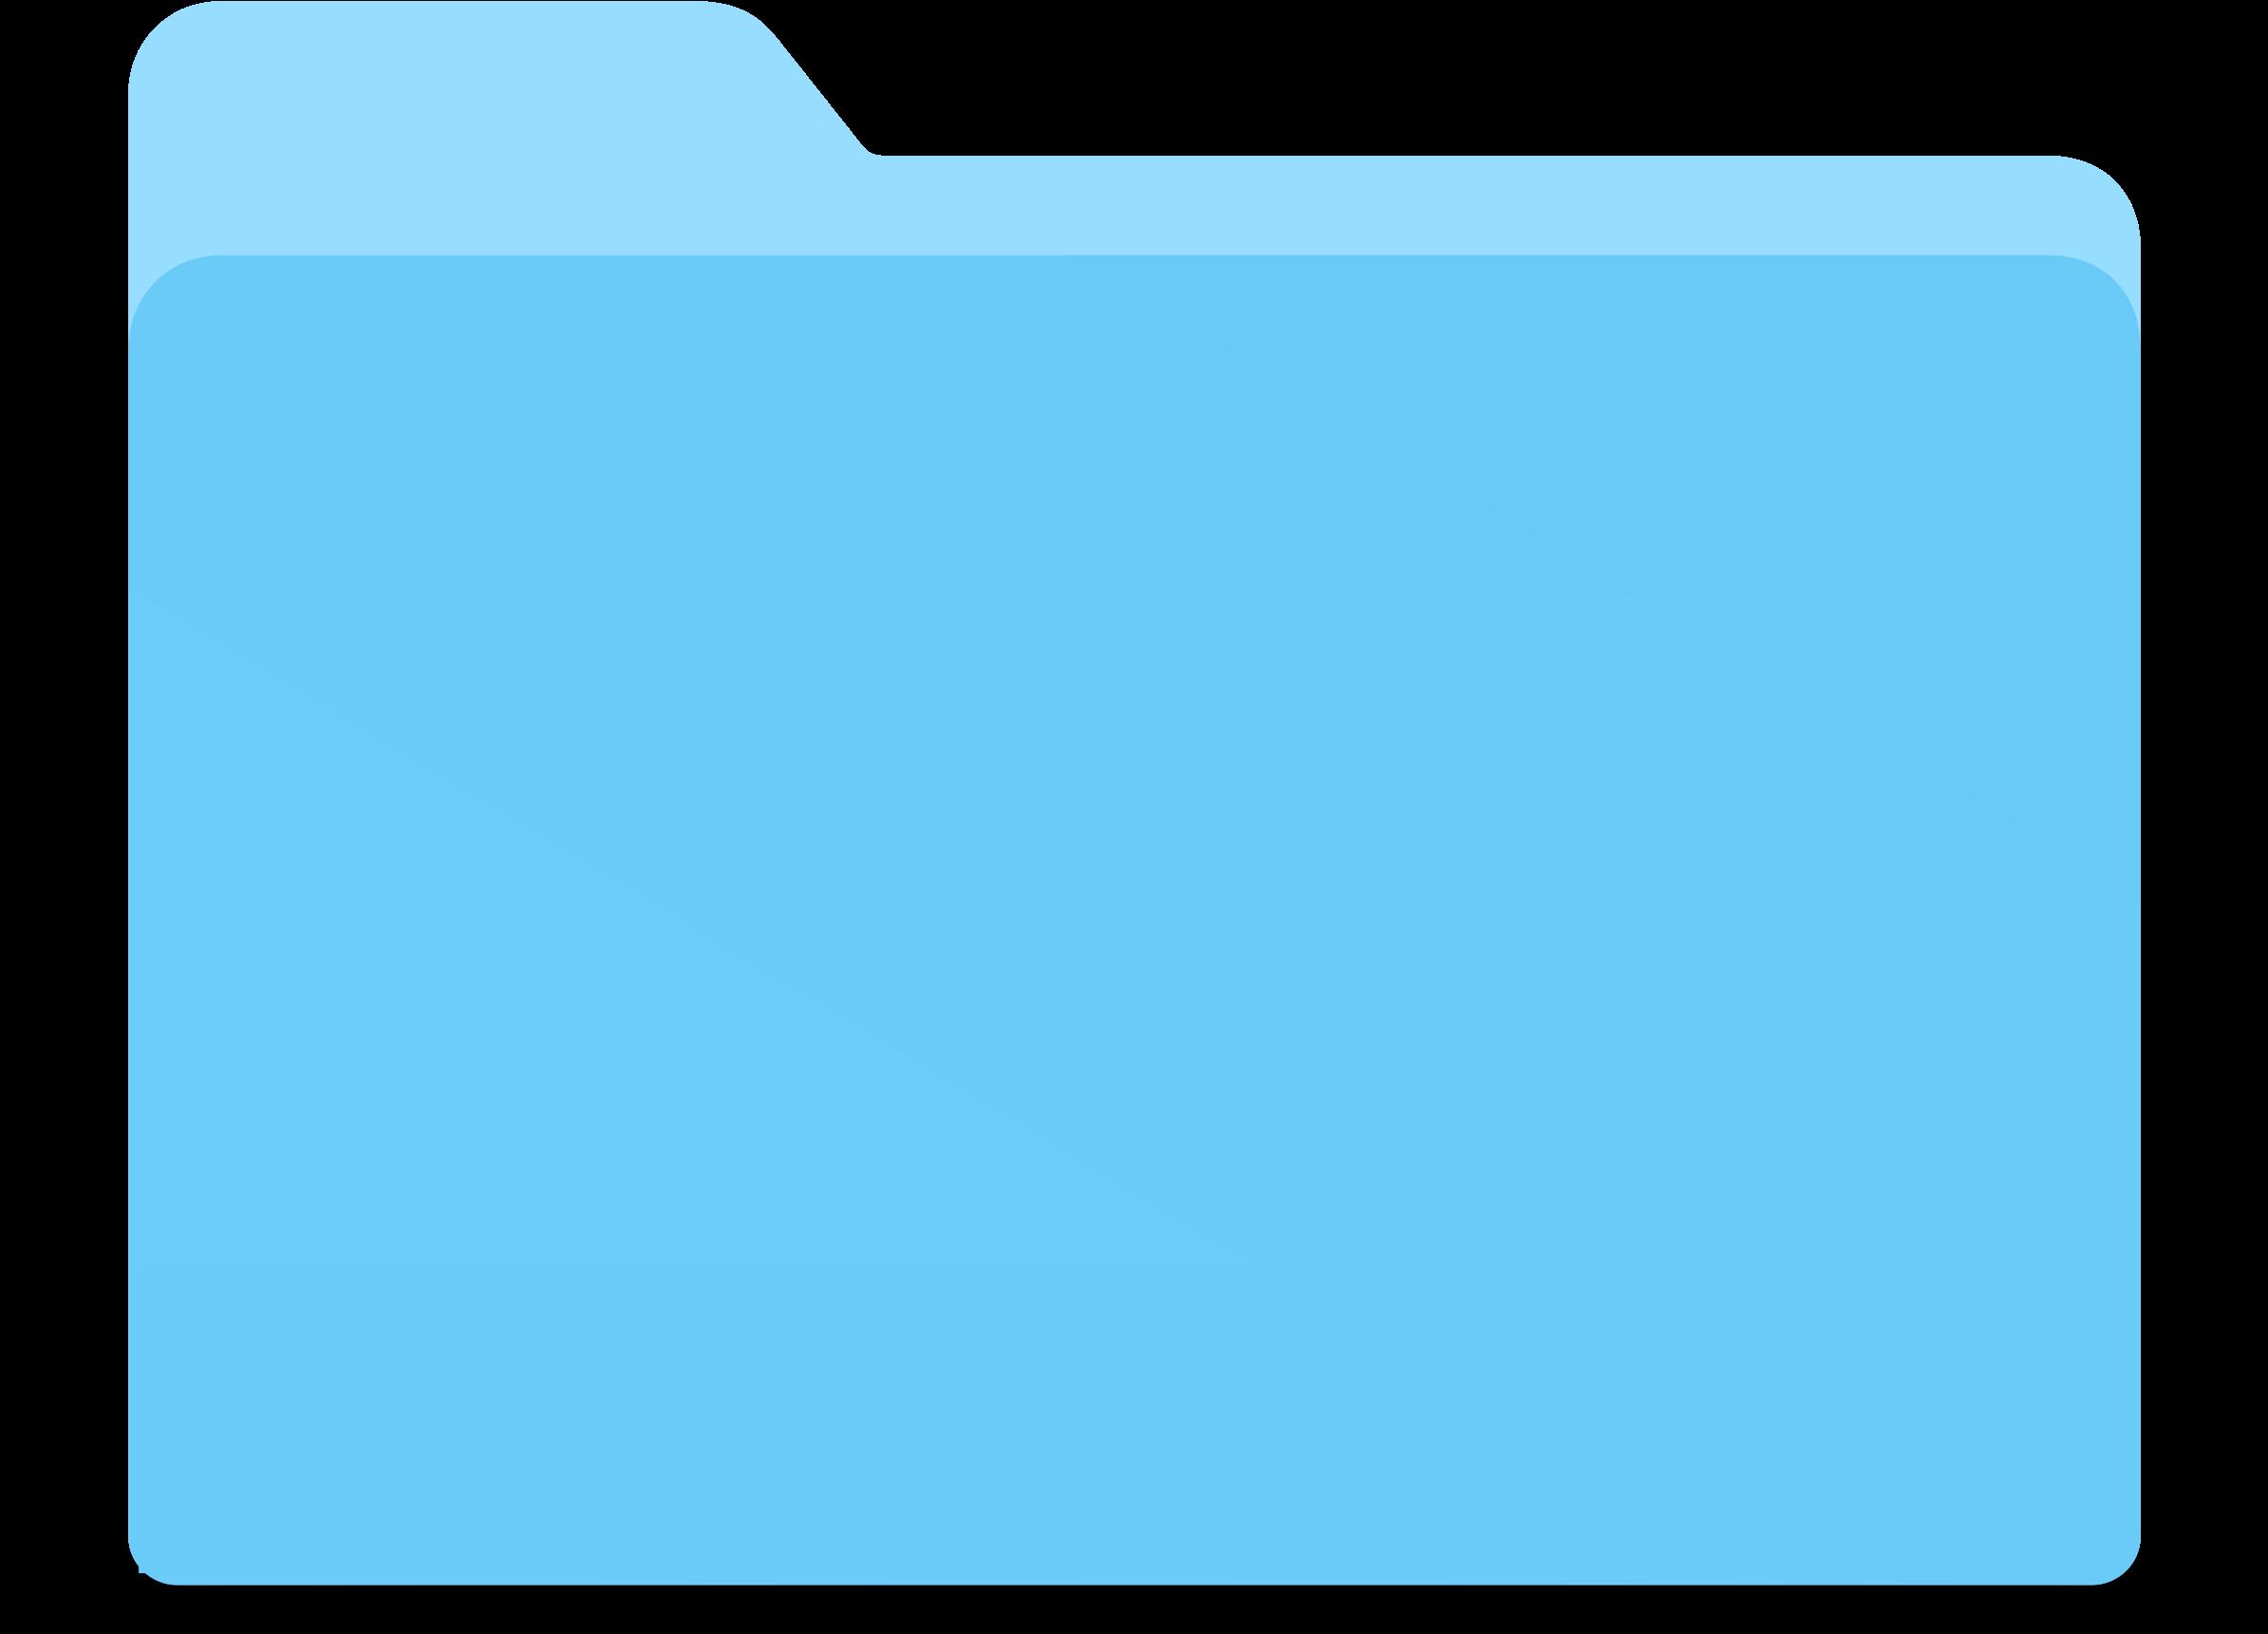 Blue Folder Vector Clipart Image.